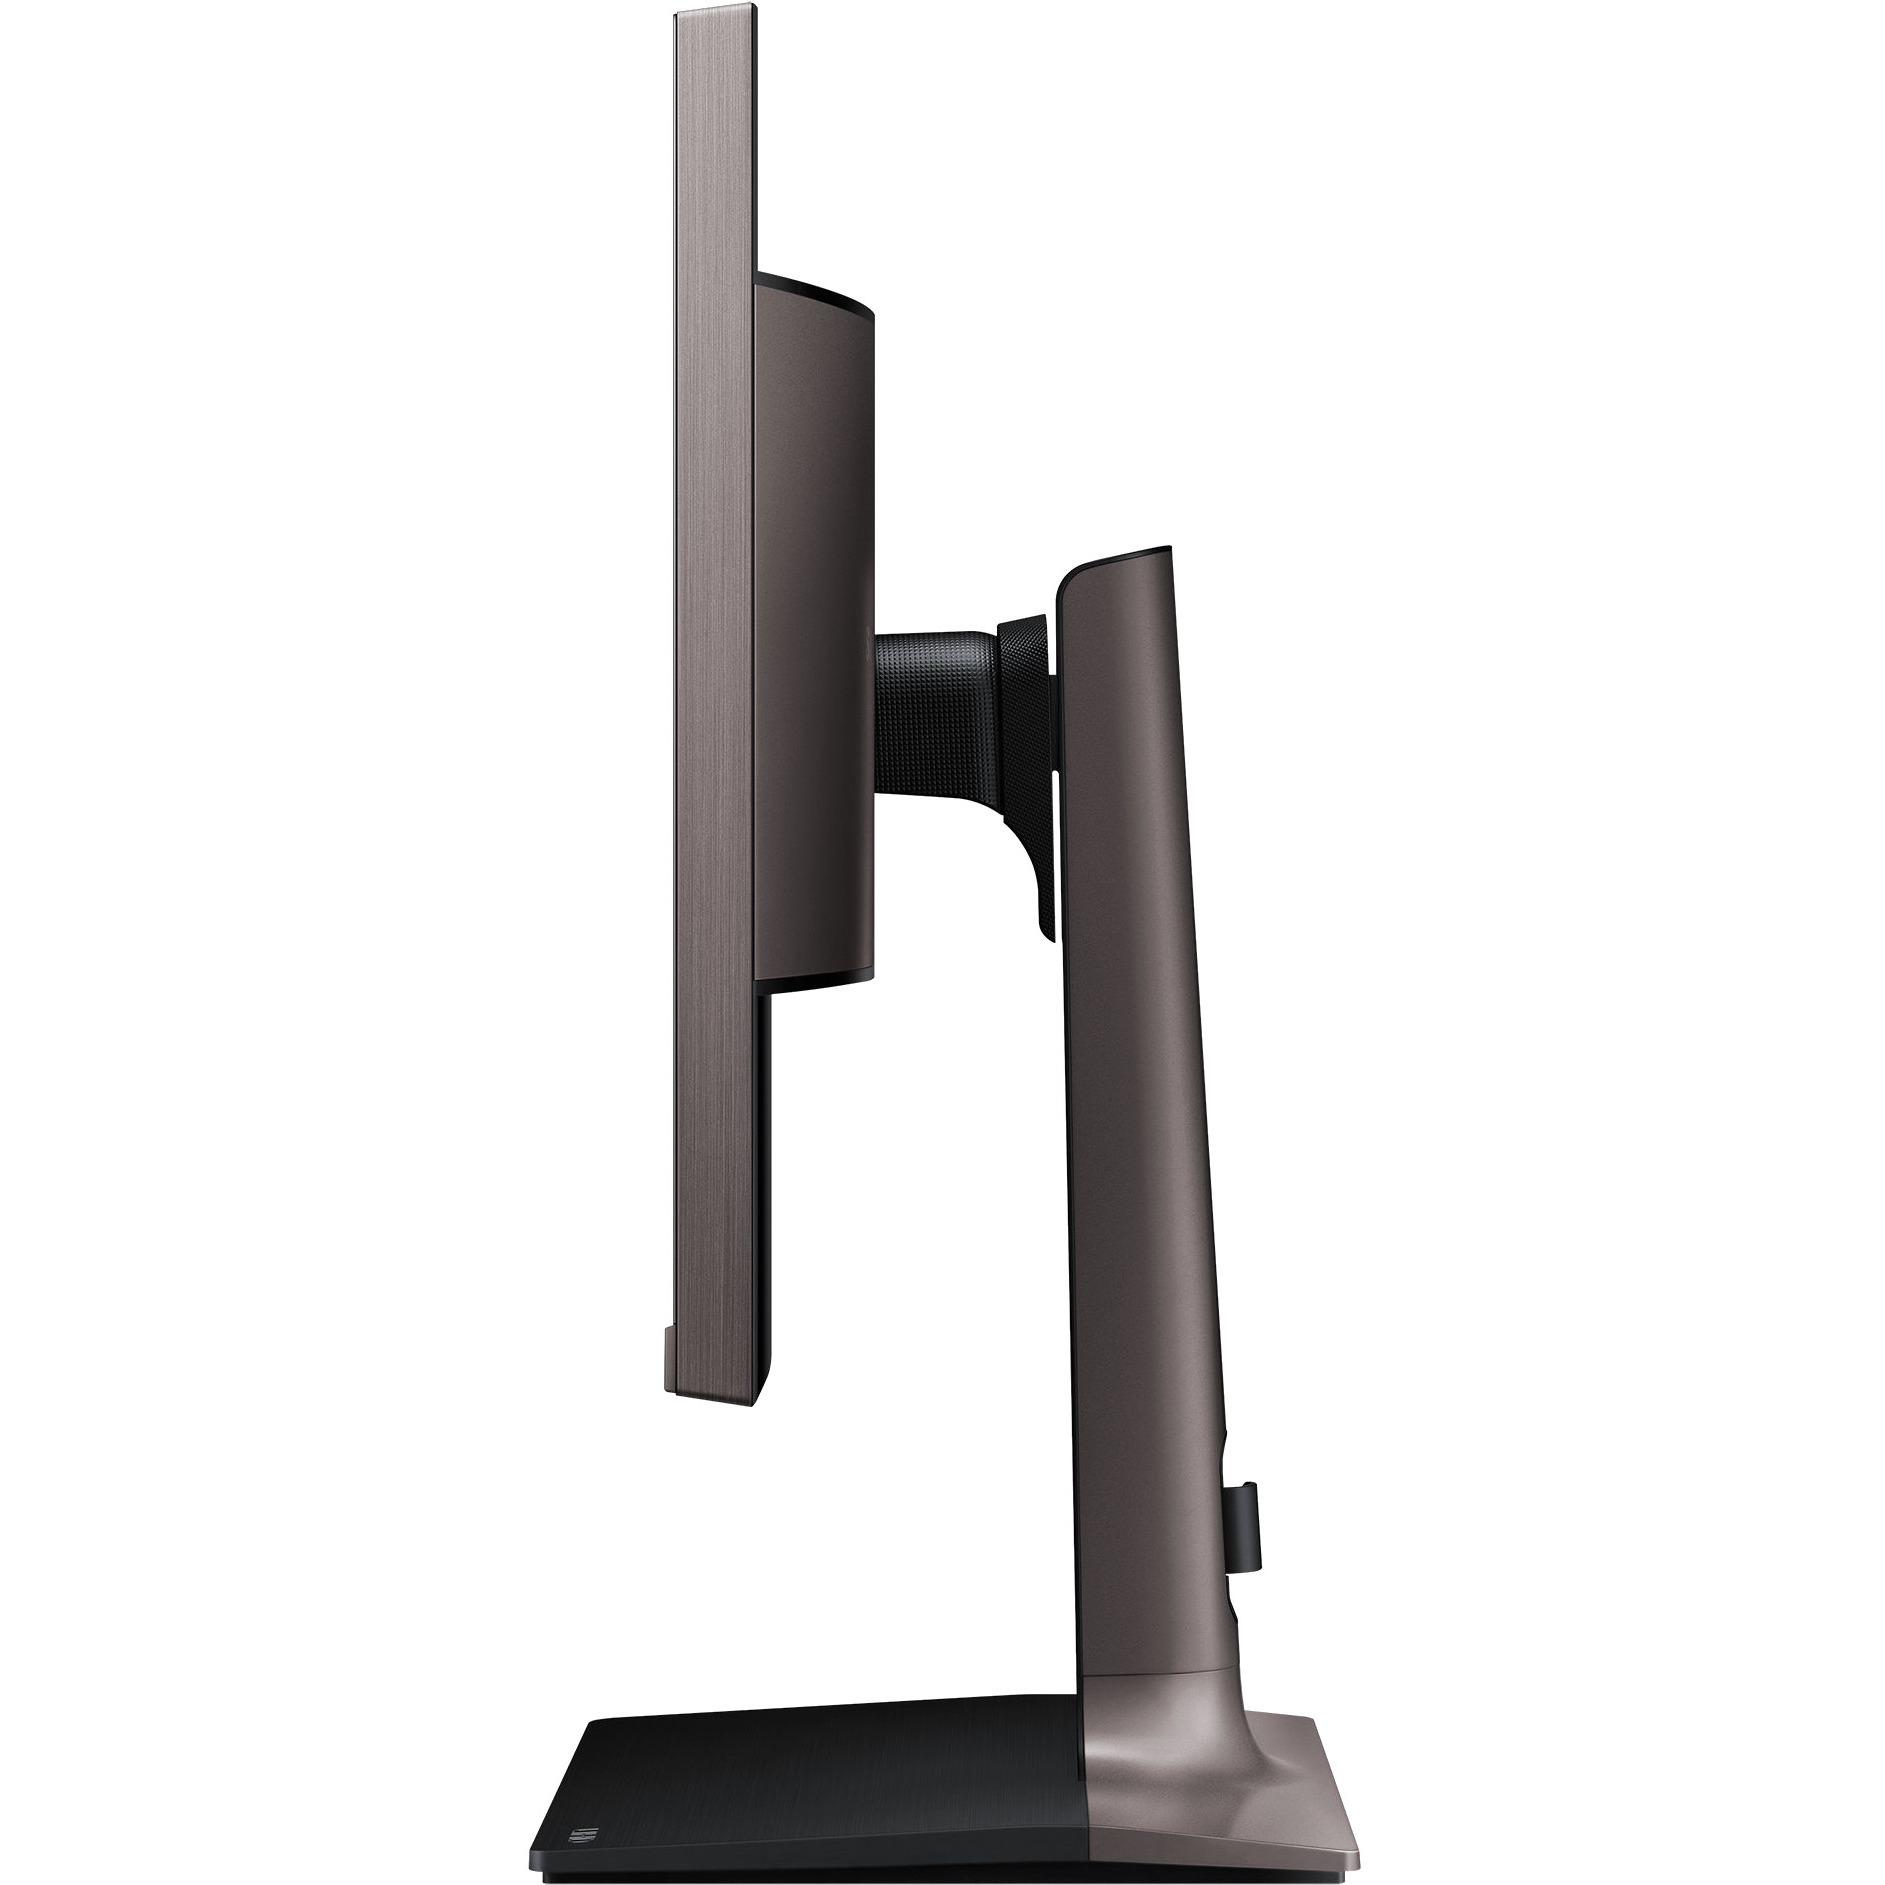 Samsung U28E850R 28inch 4k UHD Gaming Monitor